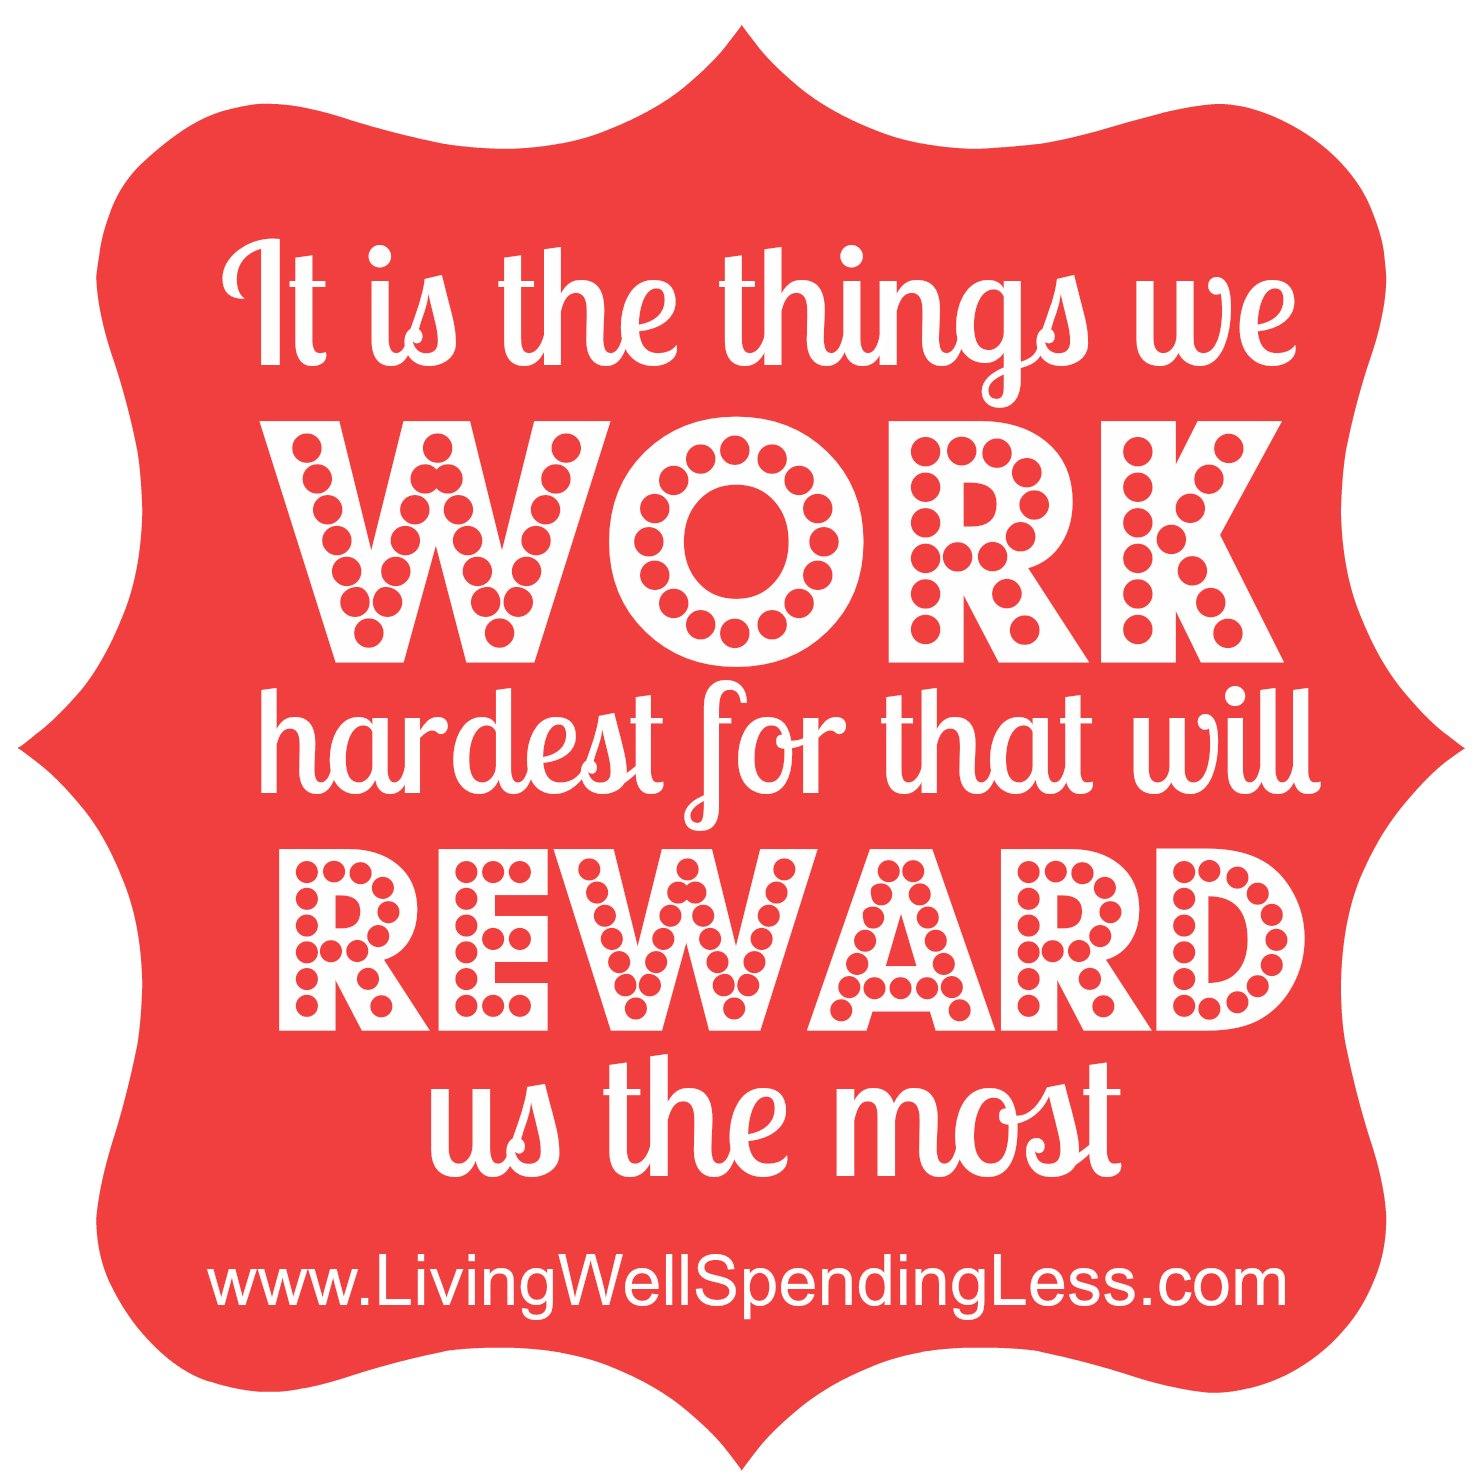 Reward quote #6